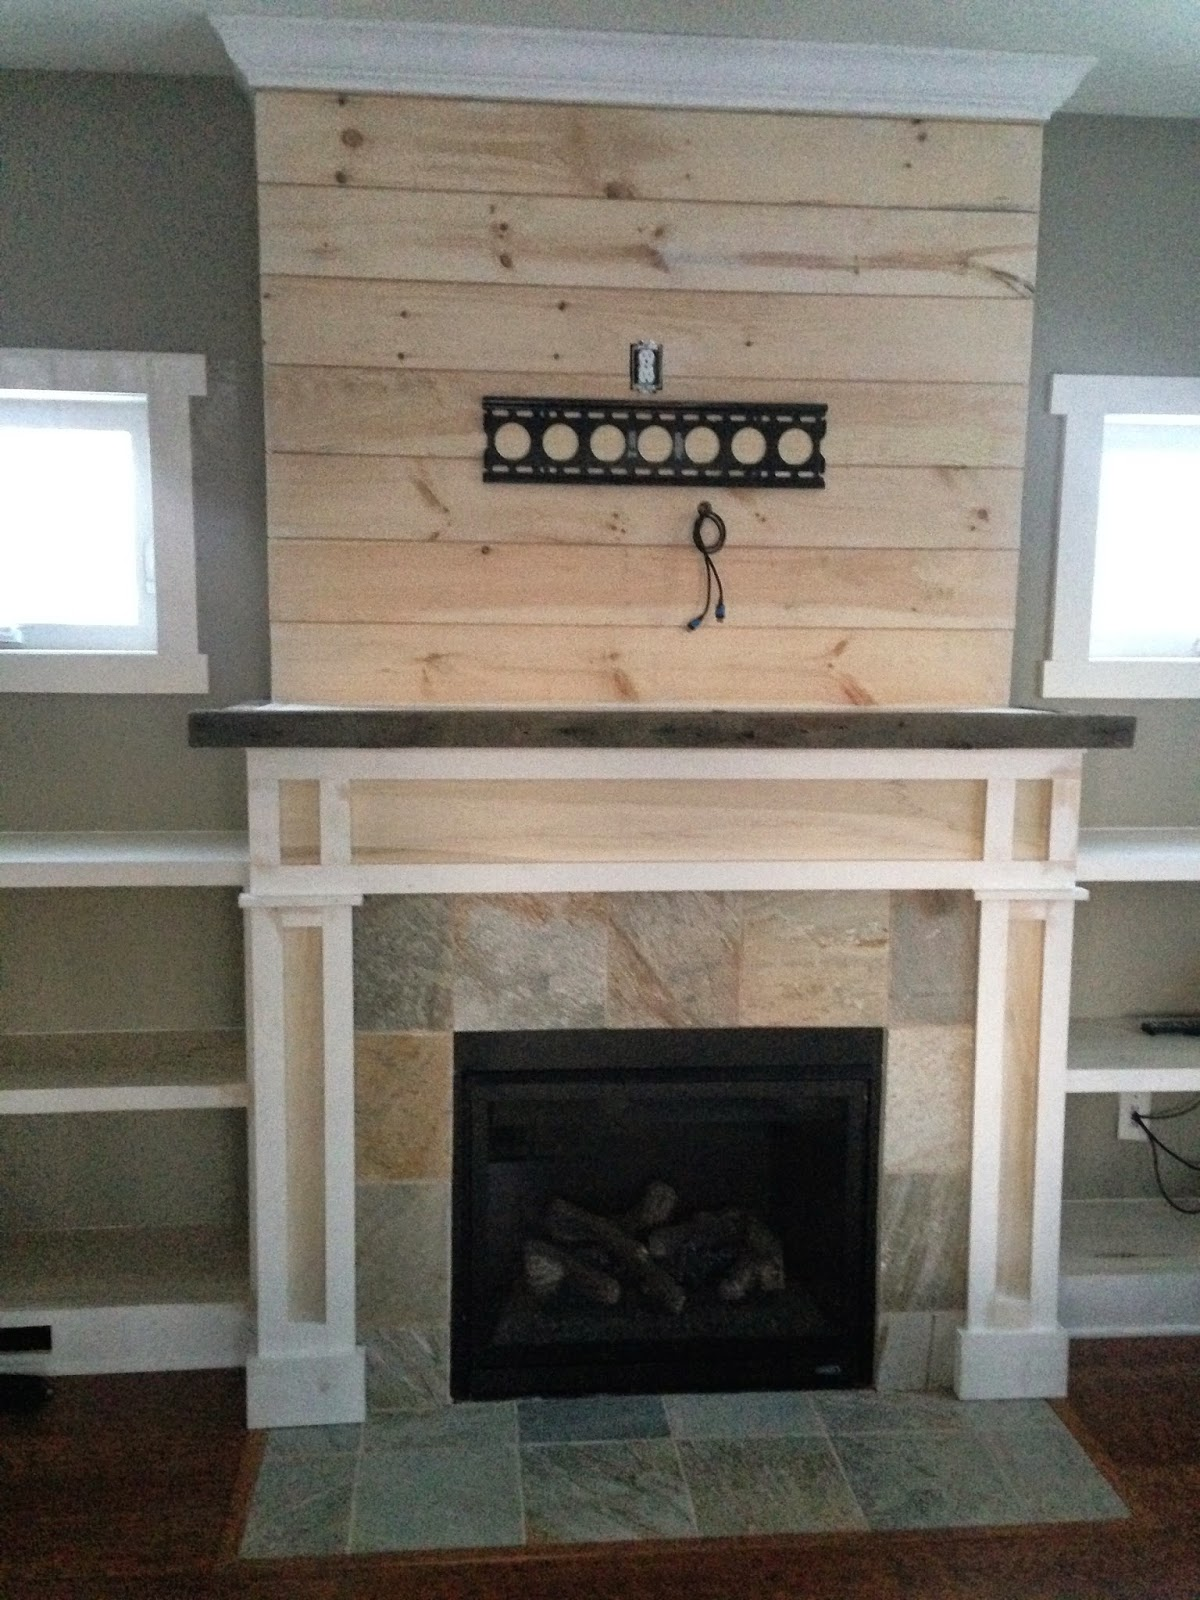 Shiplap Fireplace with Built-Ins - The Unique Nest